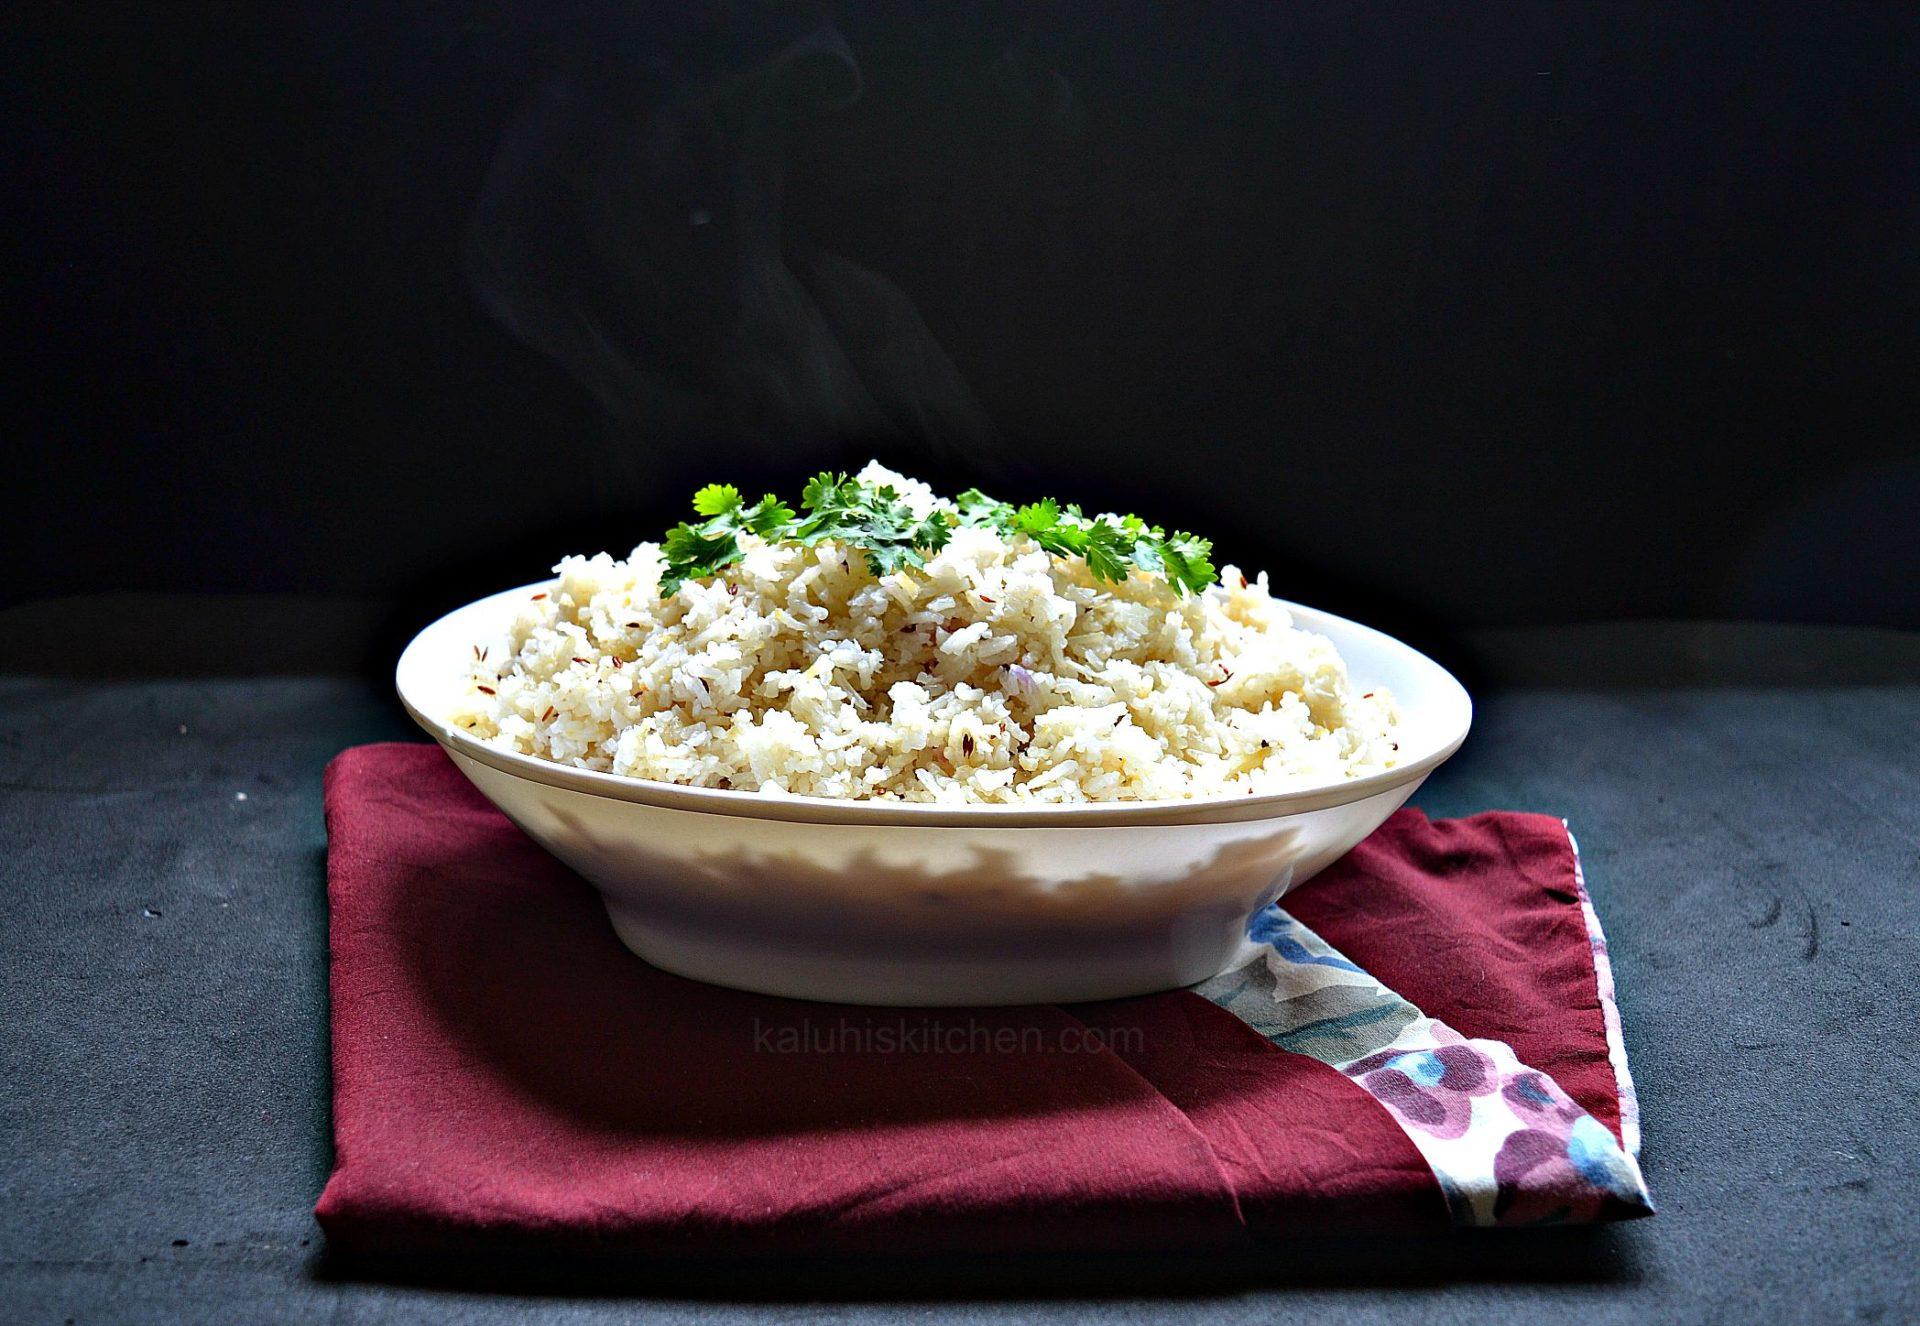 top kenyan food blogs_kaluhiskitchen.com_kenyan food_wali wa nazi